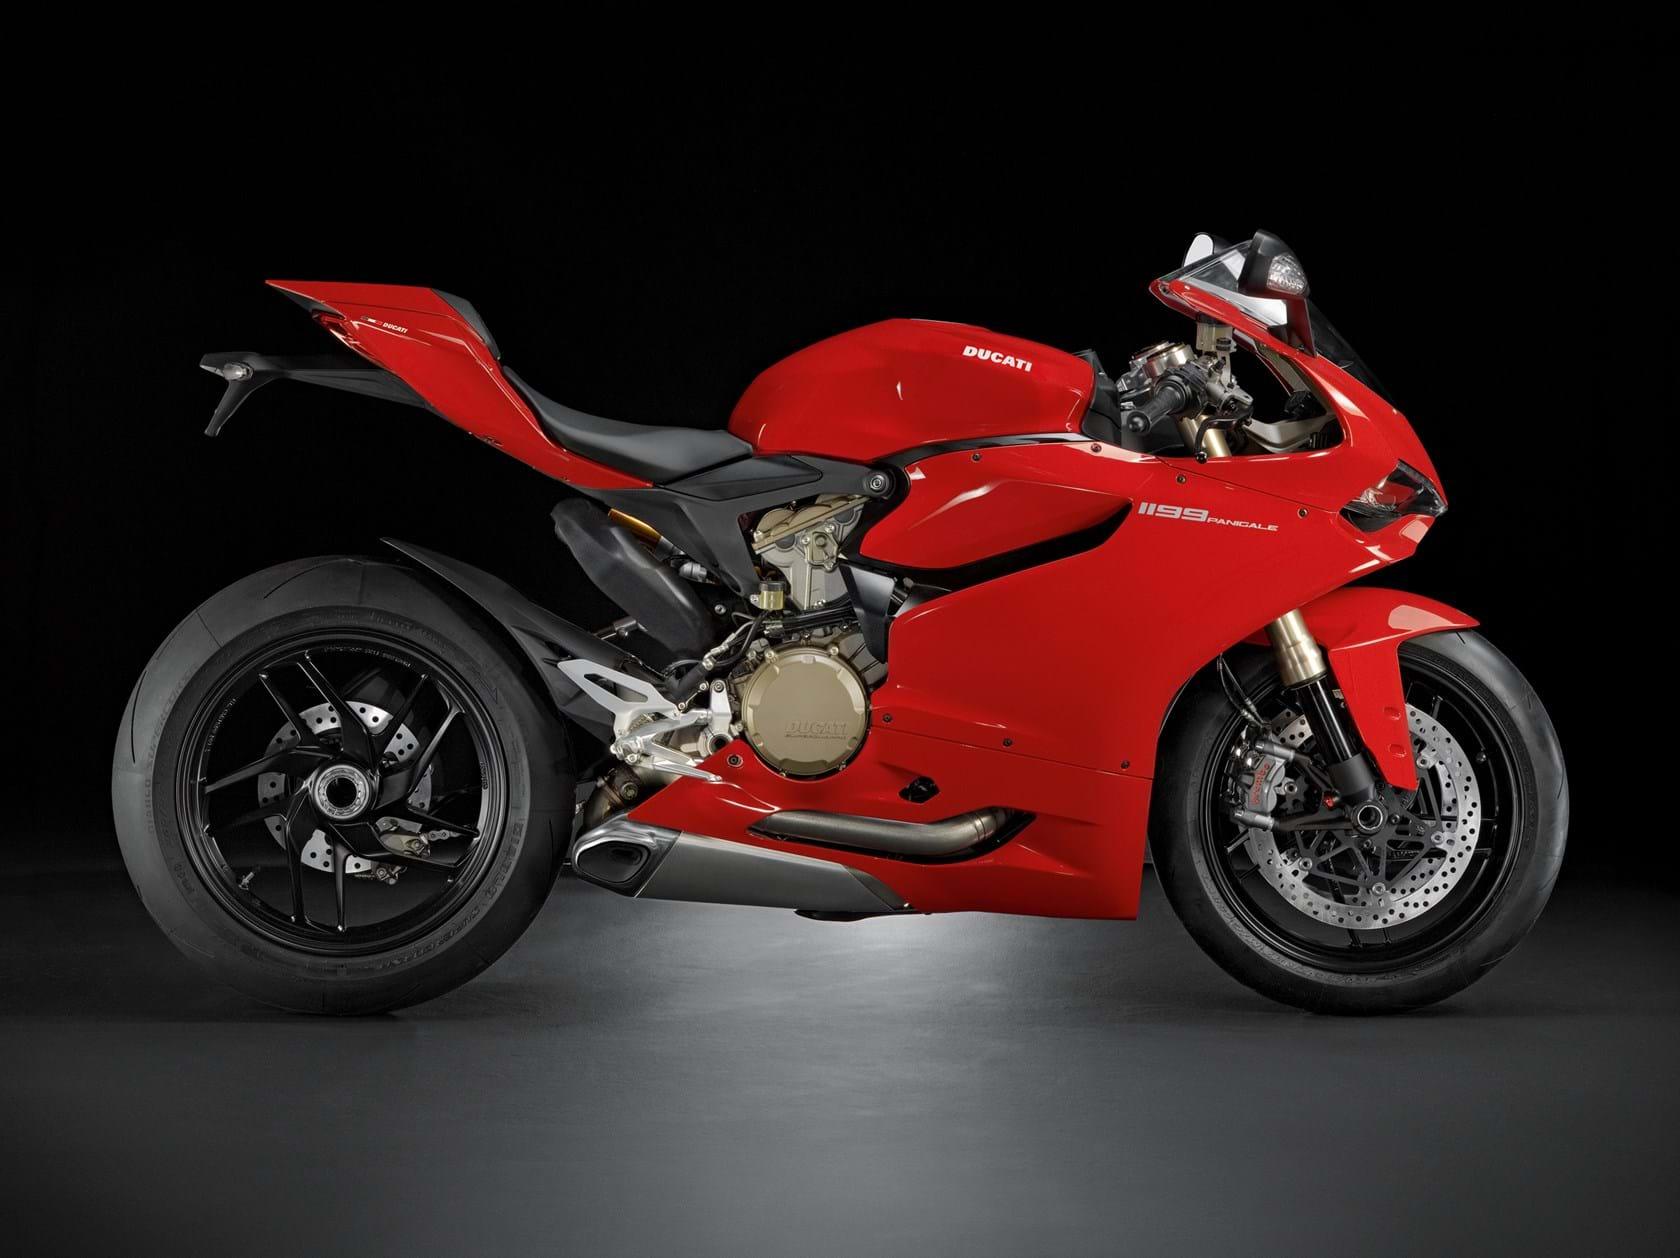 For Sale Ducati 1199 Panigale The Bike Market